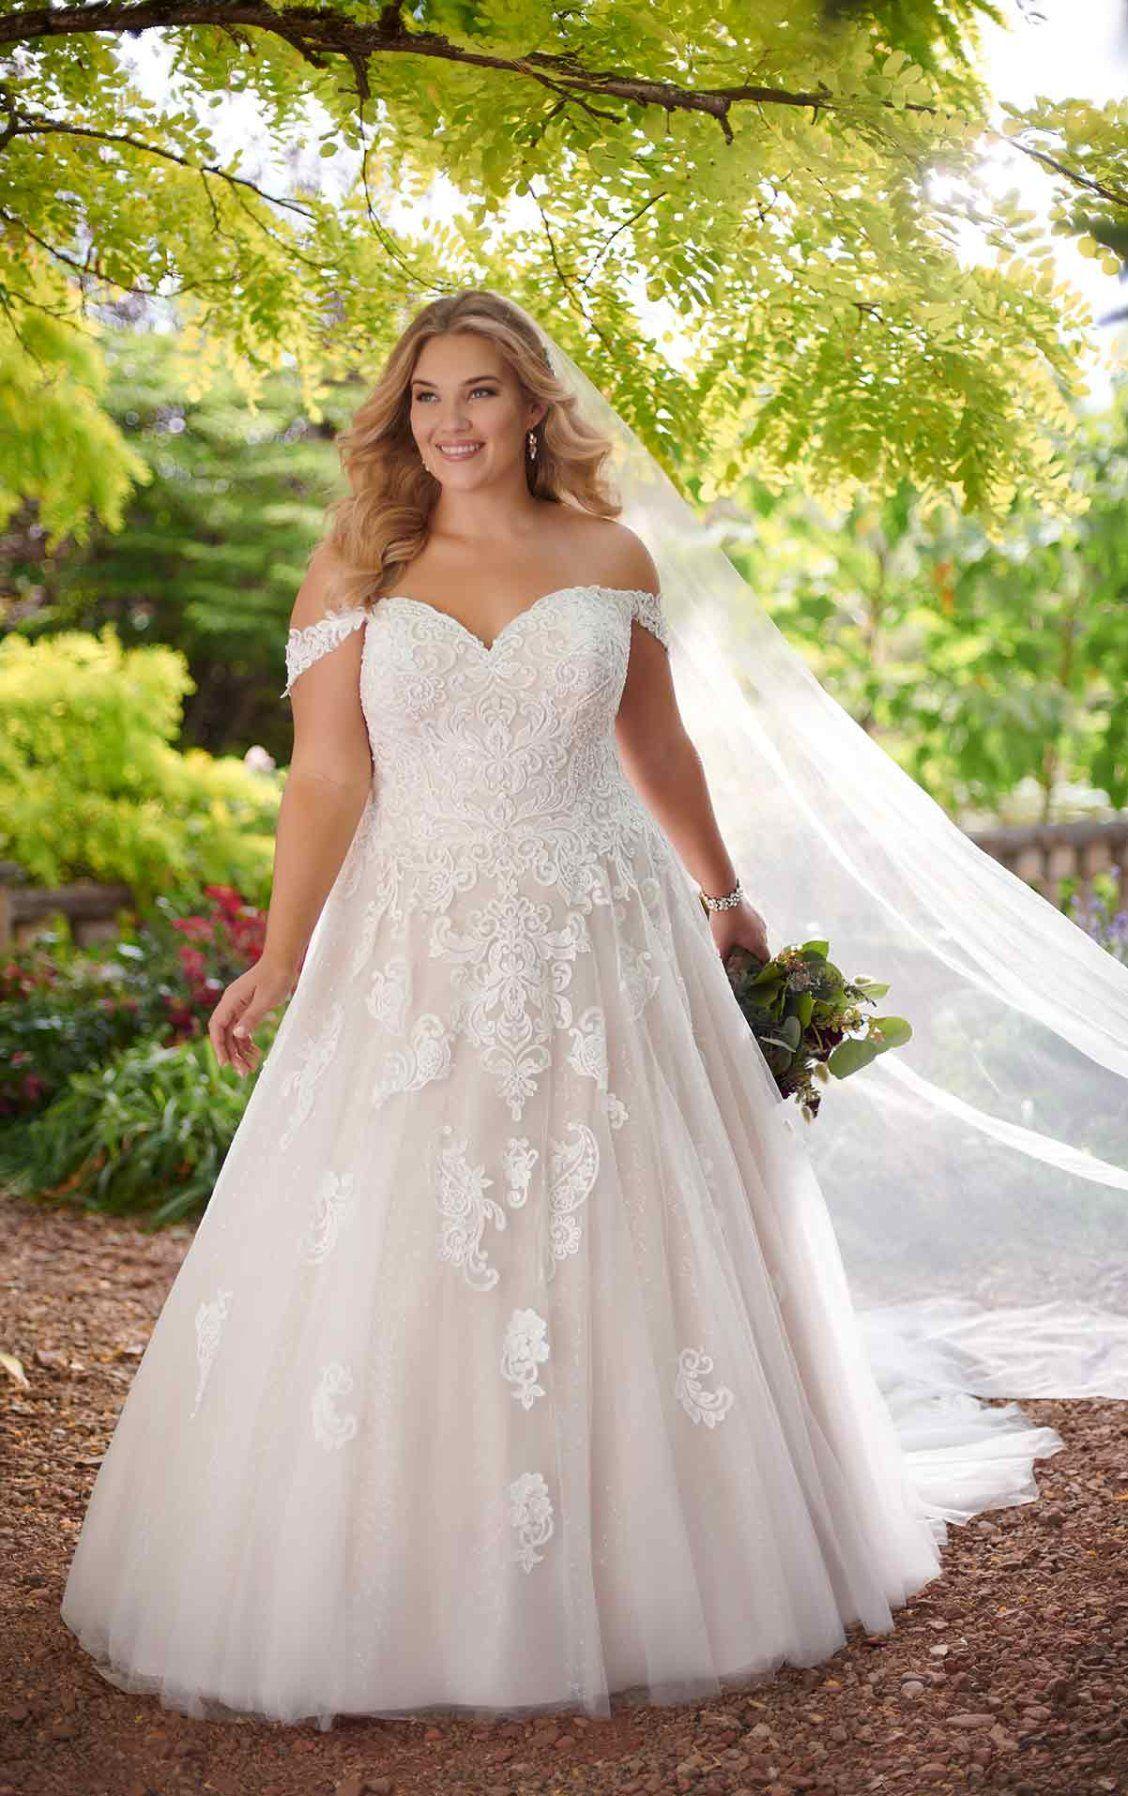 Wedding dresses for curvy brides  Mermaid Wedding Dress with Rich Beadwork  Wedding  Pinterest